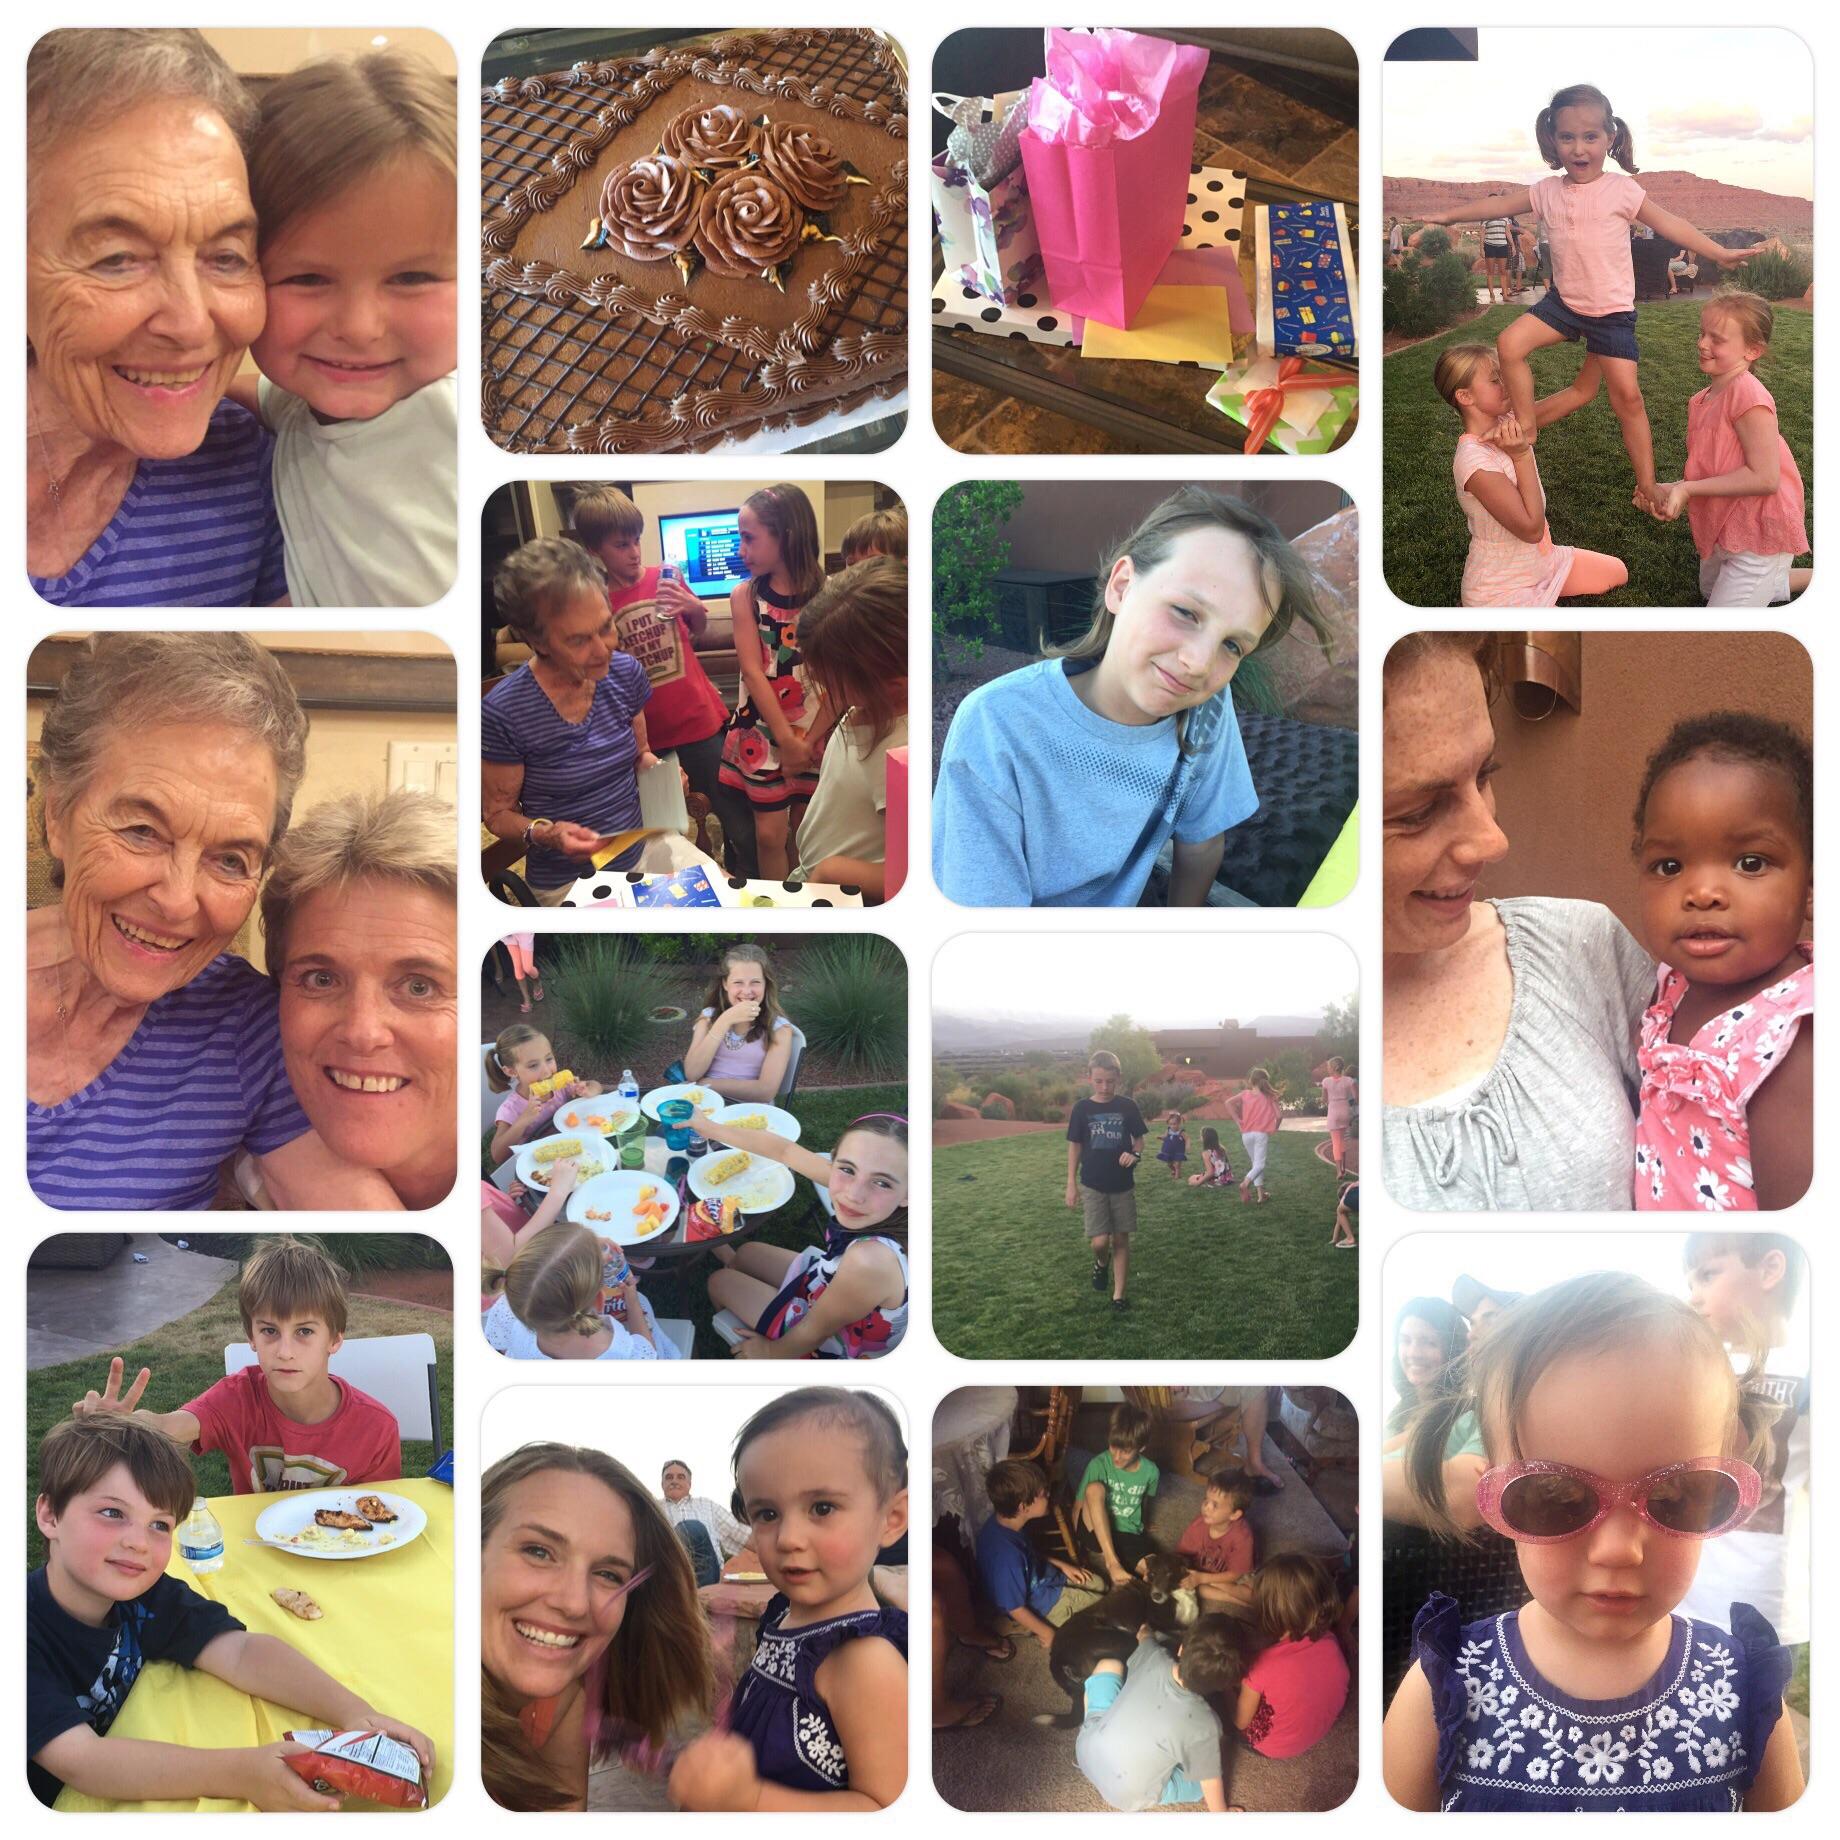 Grandma LaRue's 85th Birthday party